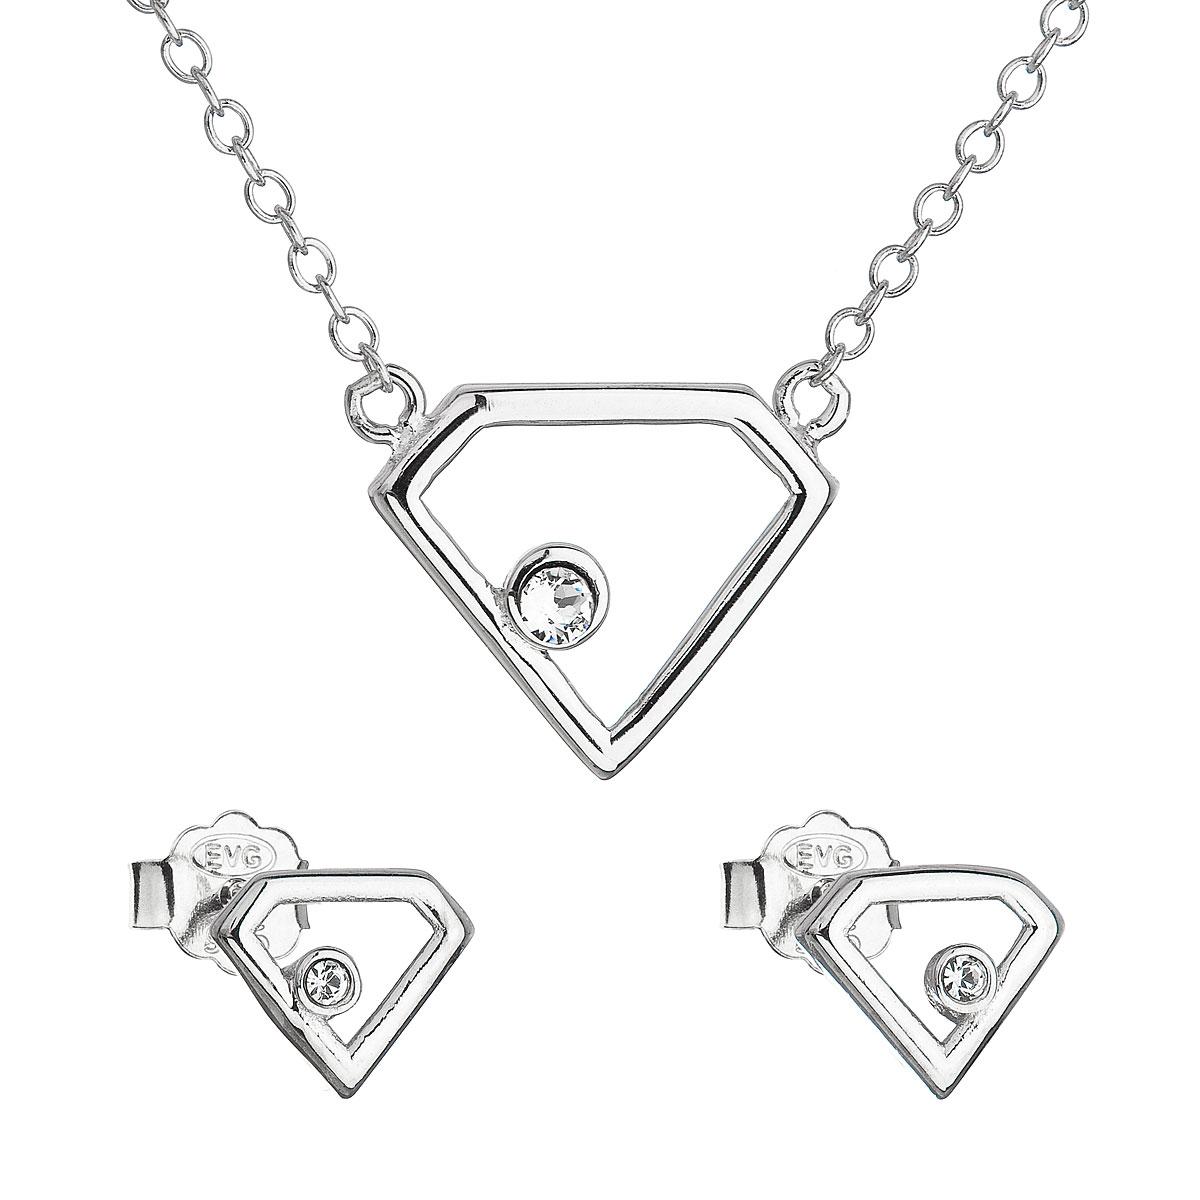 Sada šperků s krystaly Swarovski náušnice a náhrdelník bílý trojúhelník 39165.1